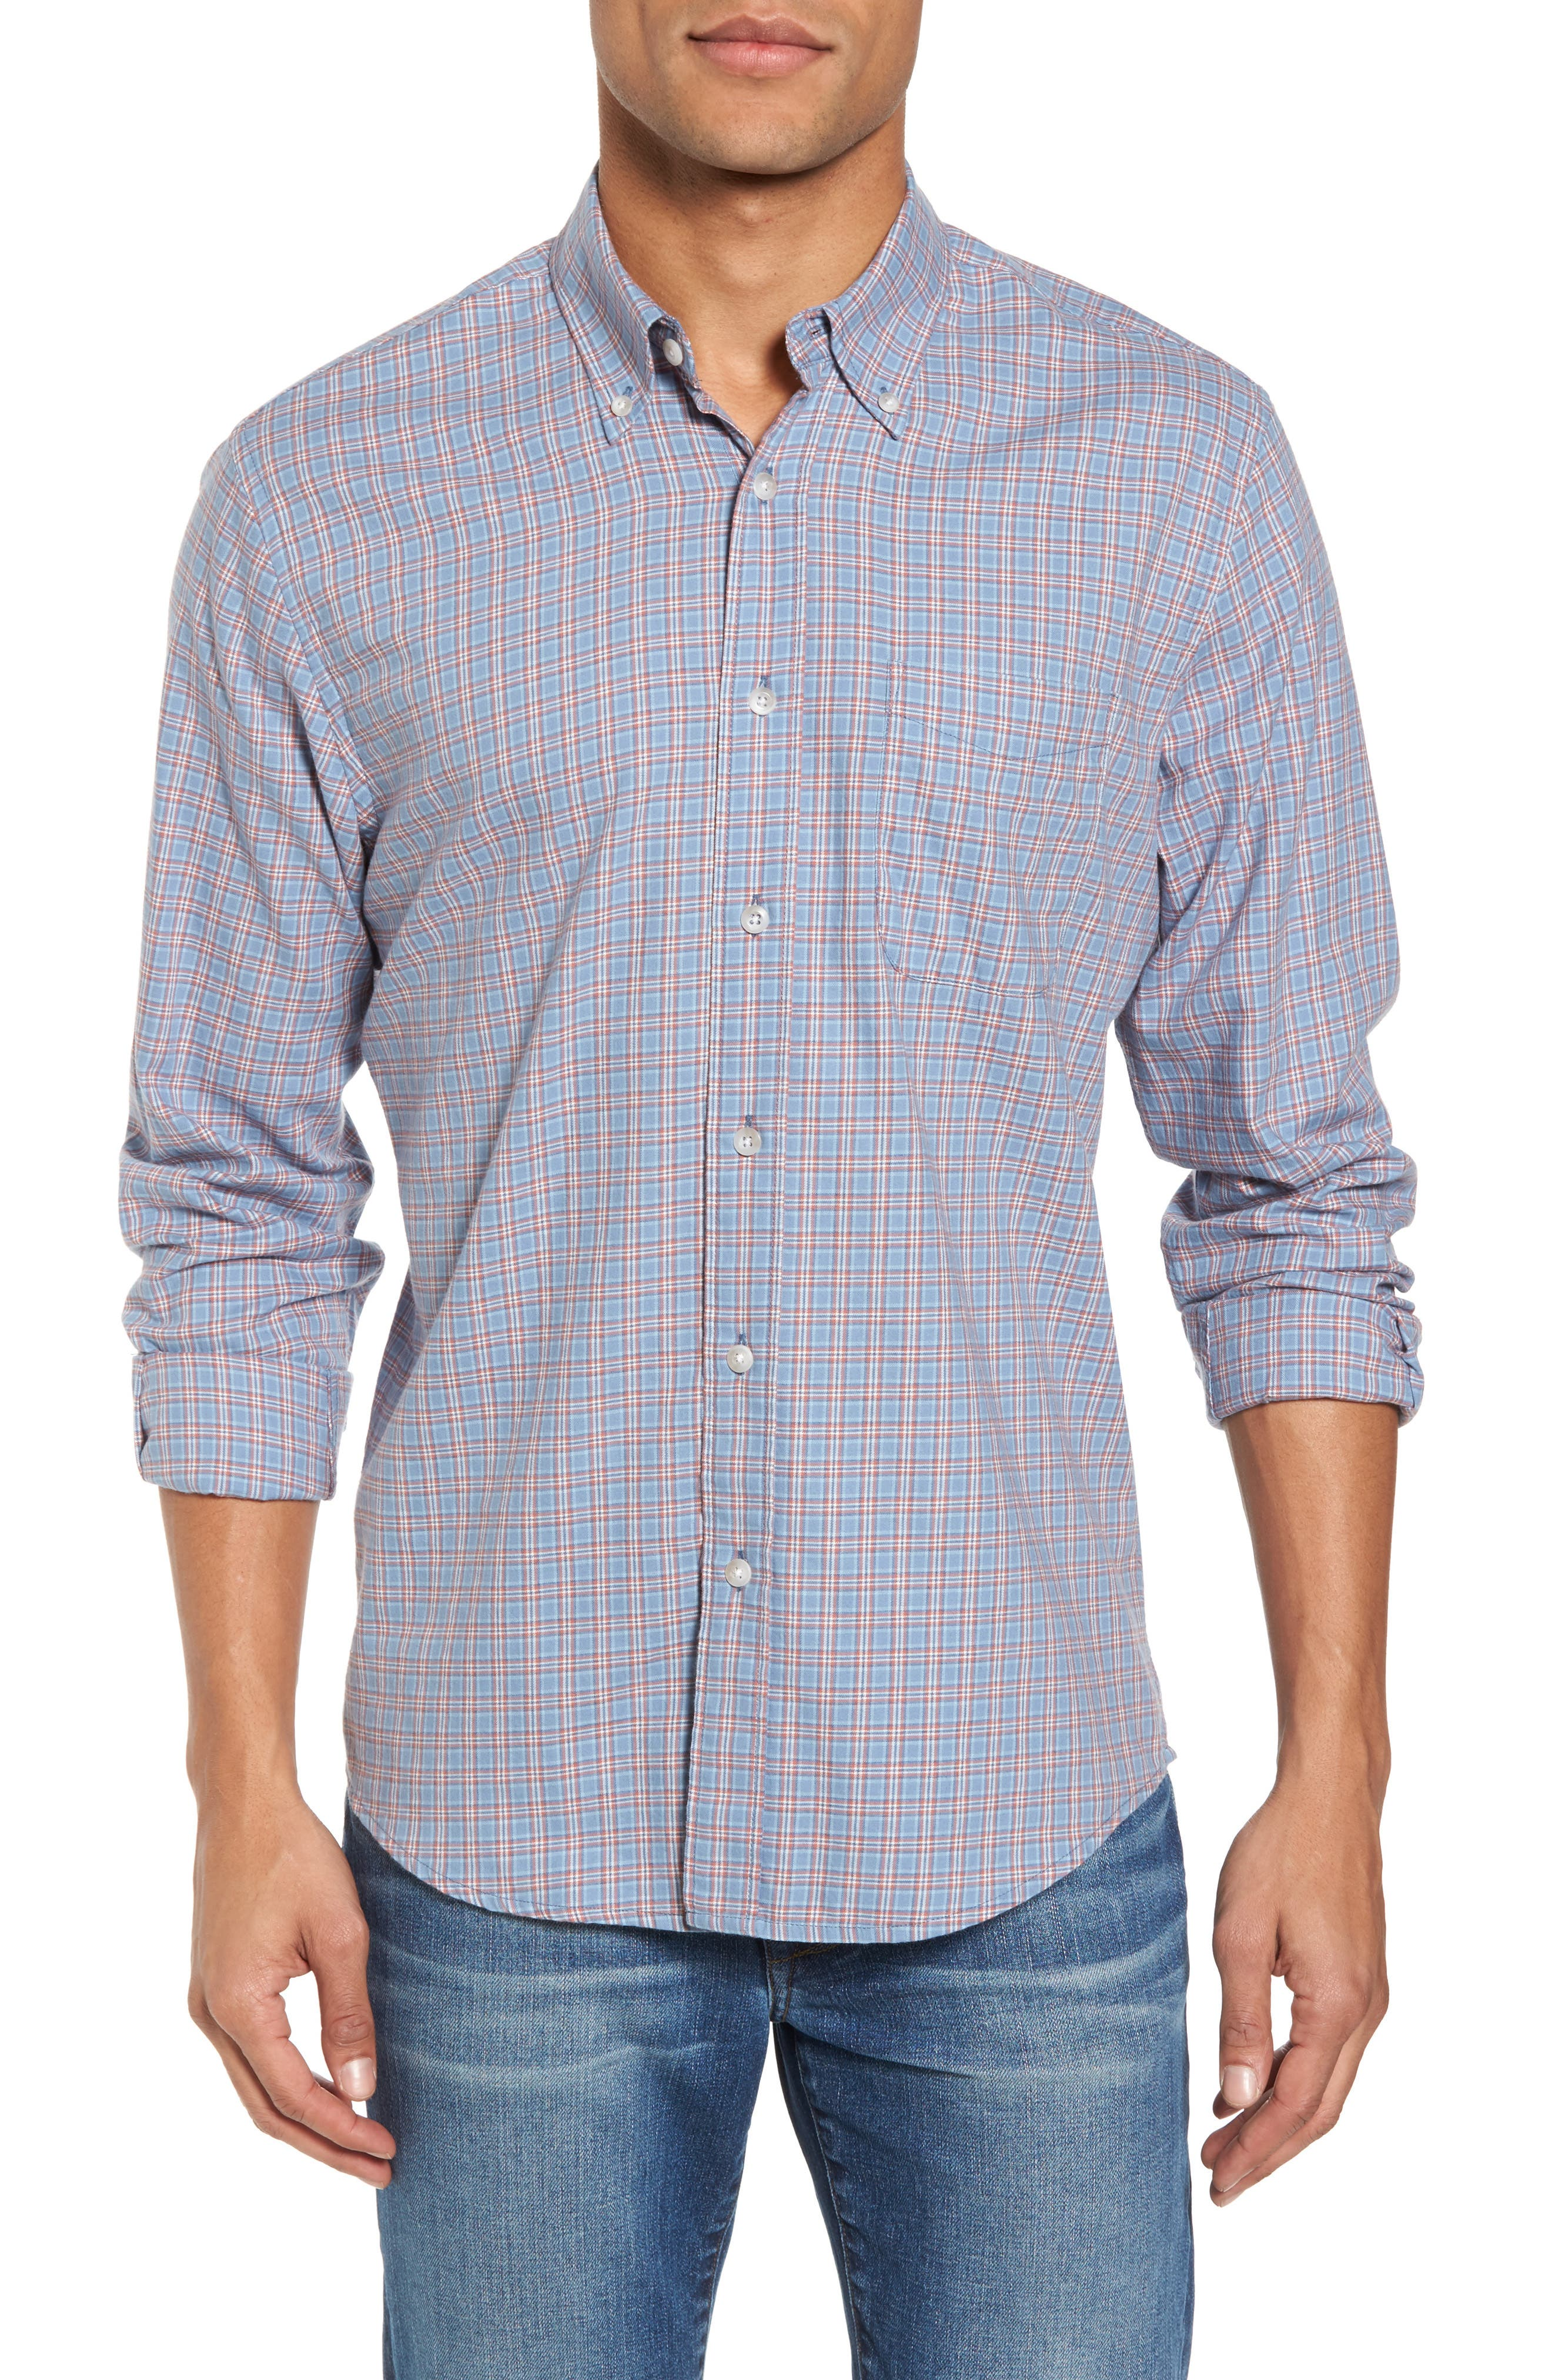 Ventura Plaid Sport Shirt,                             Main thumbnail 1, color,                             Light Blue Autumn Check